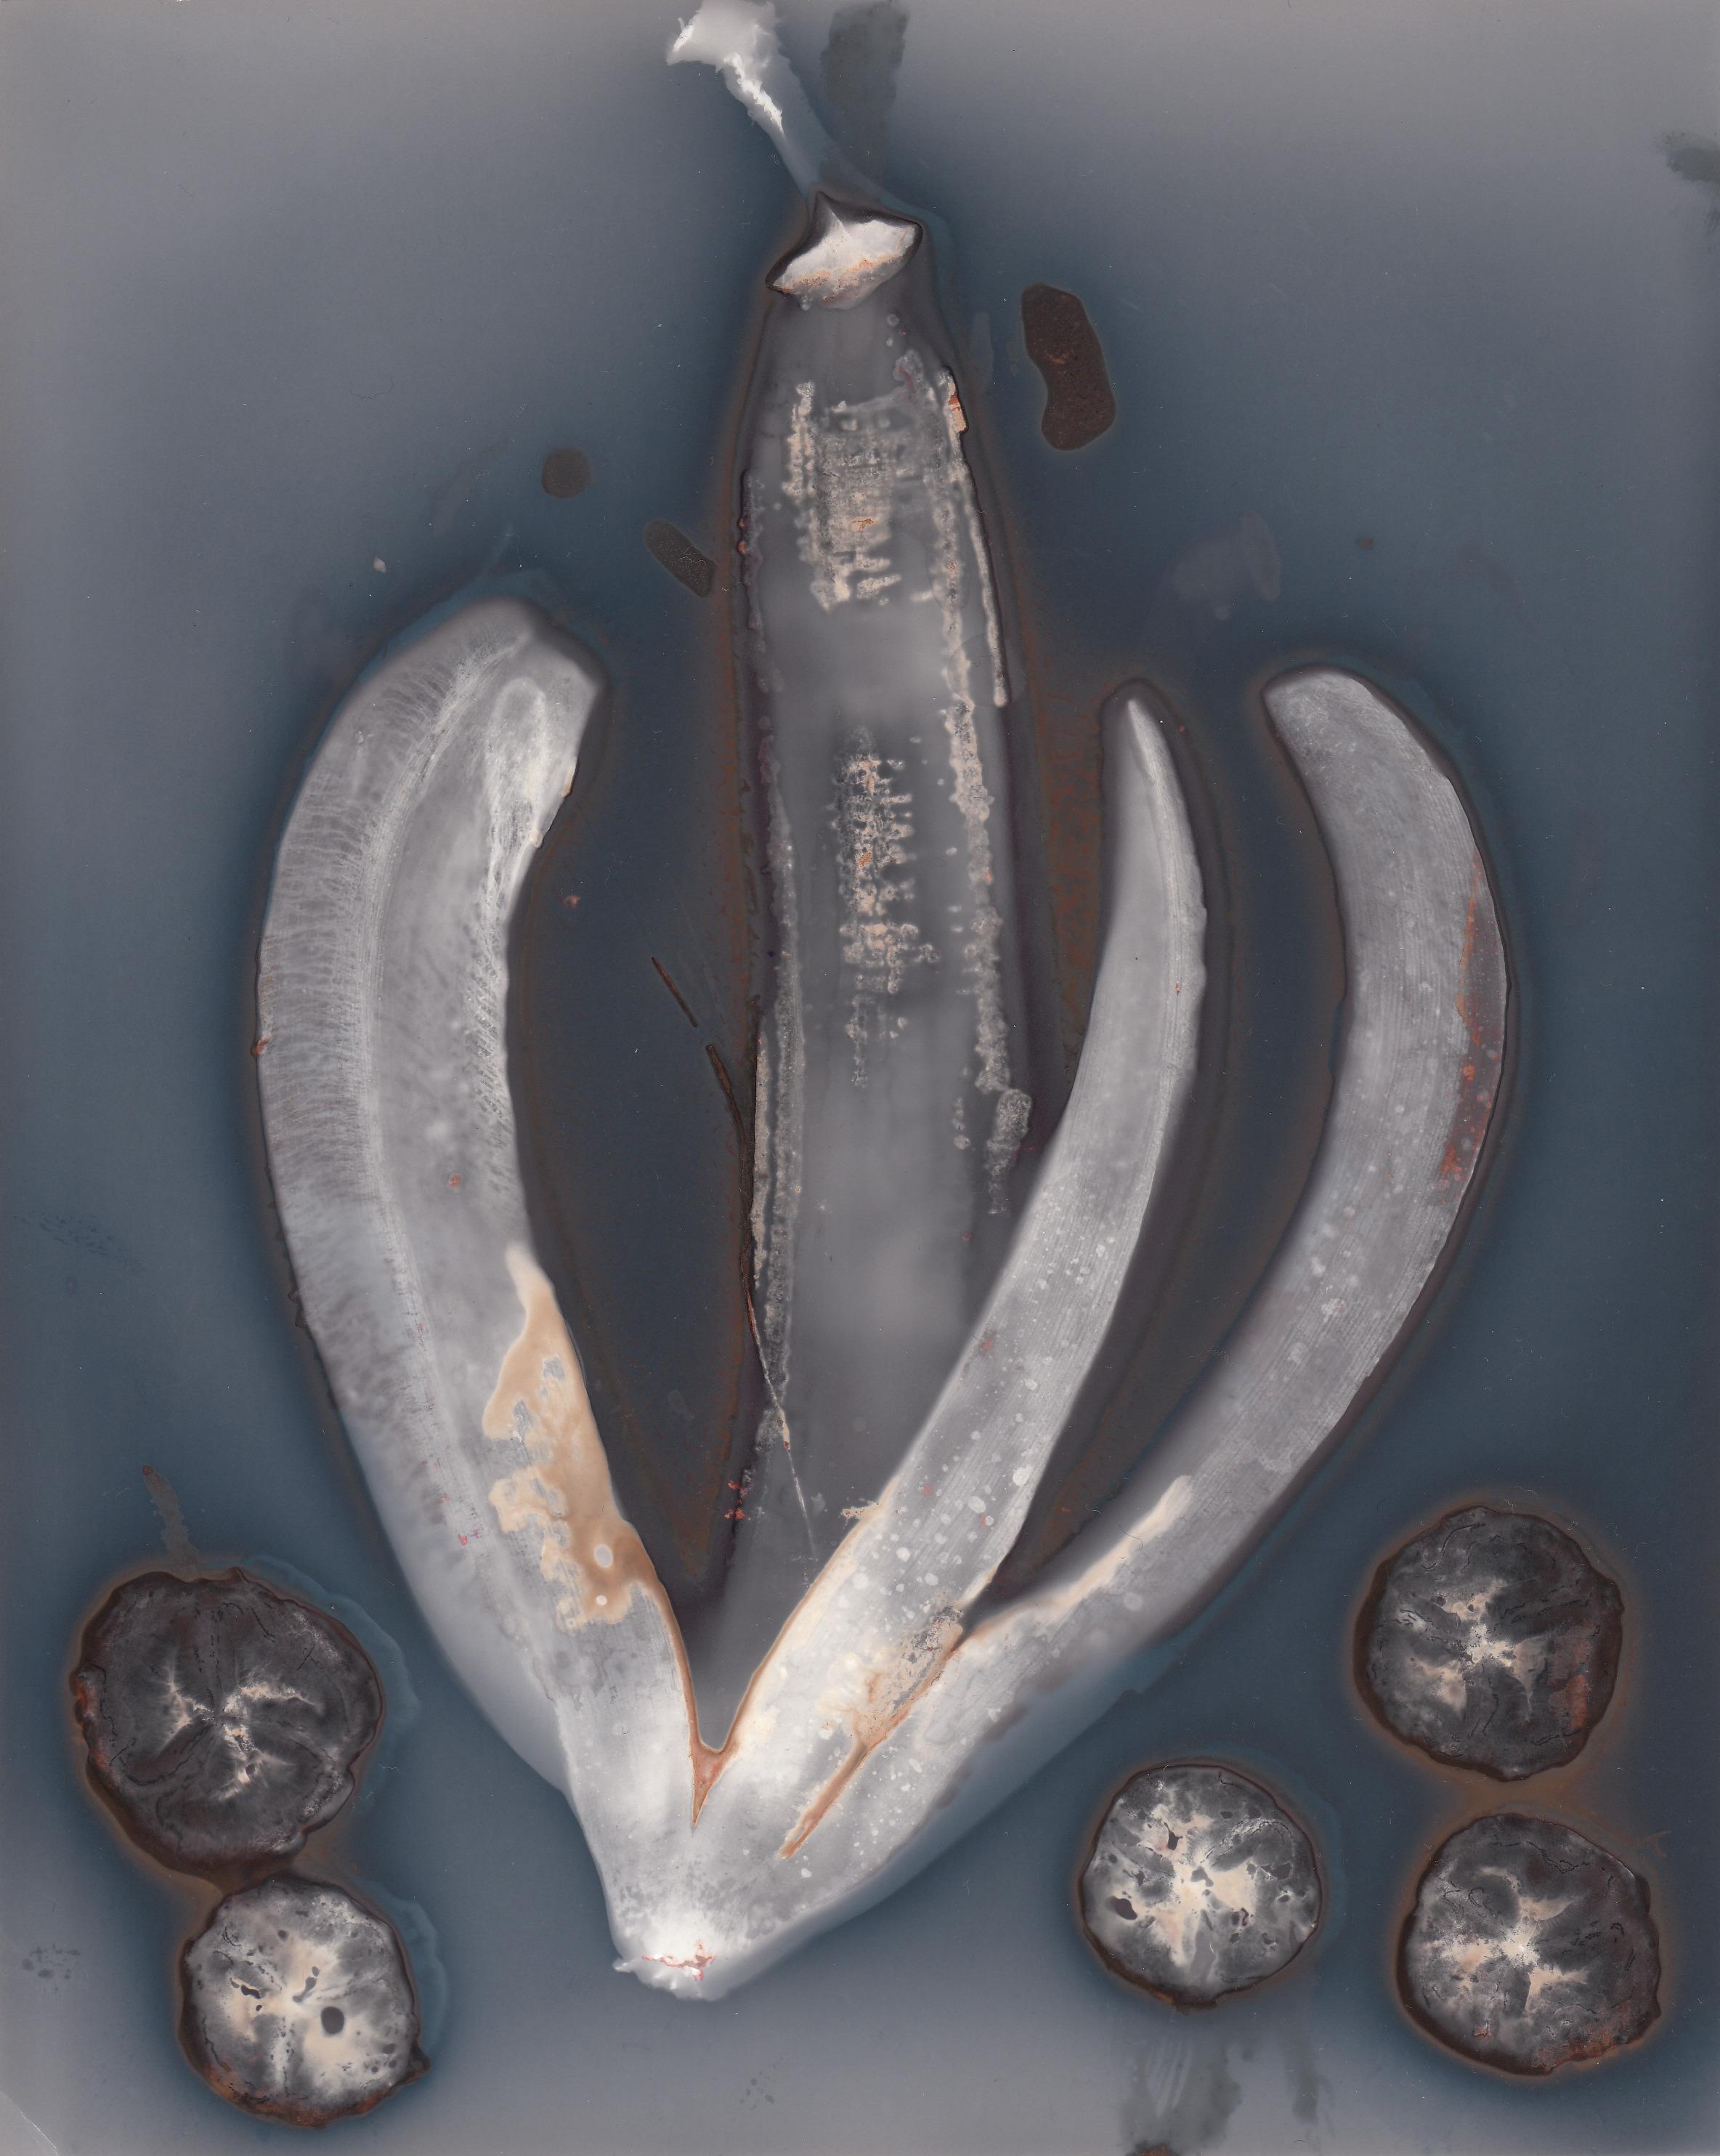 Banana Peel & Slices